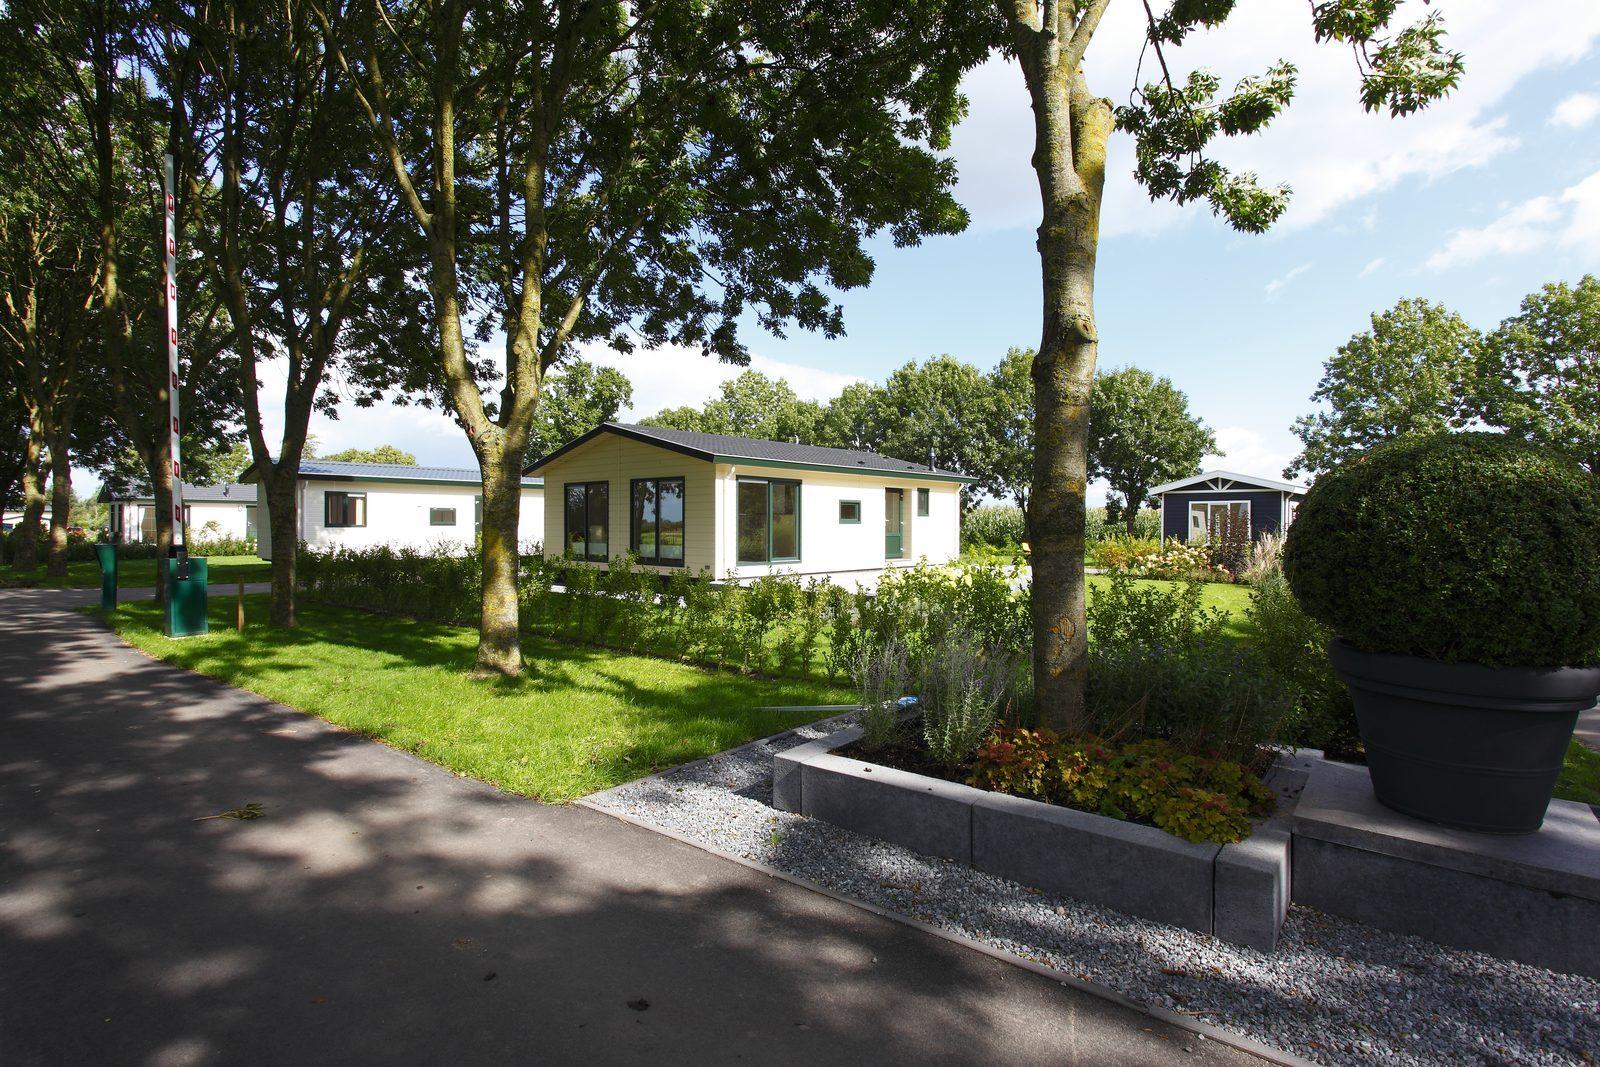 Buy a holiday home in Benschop